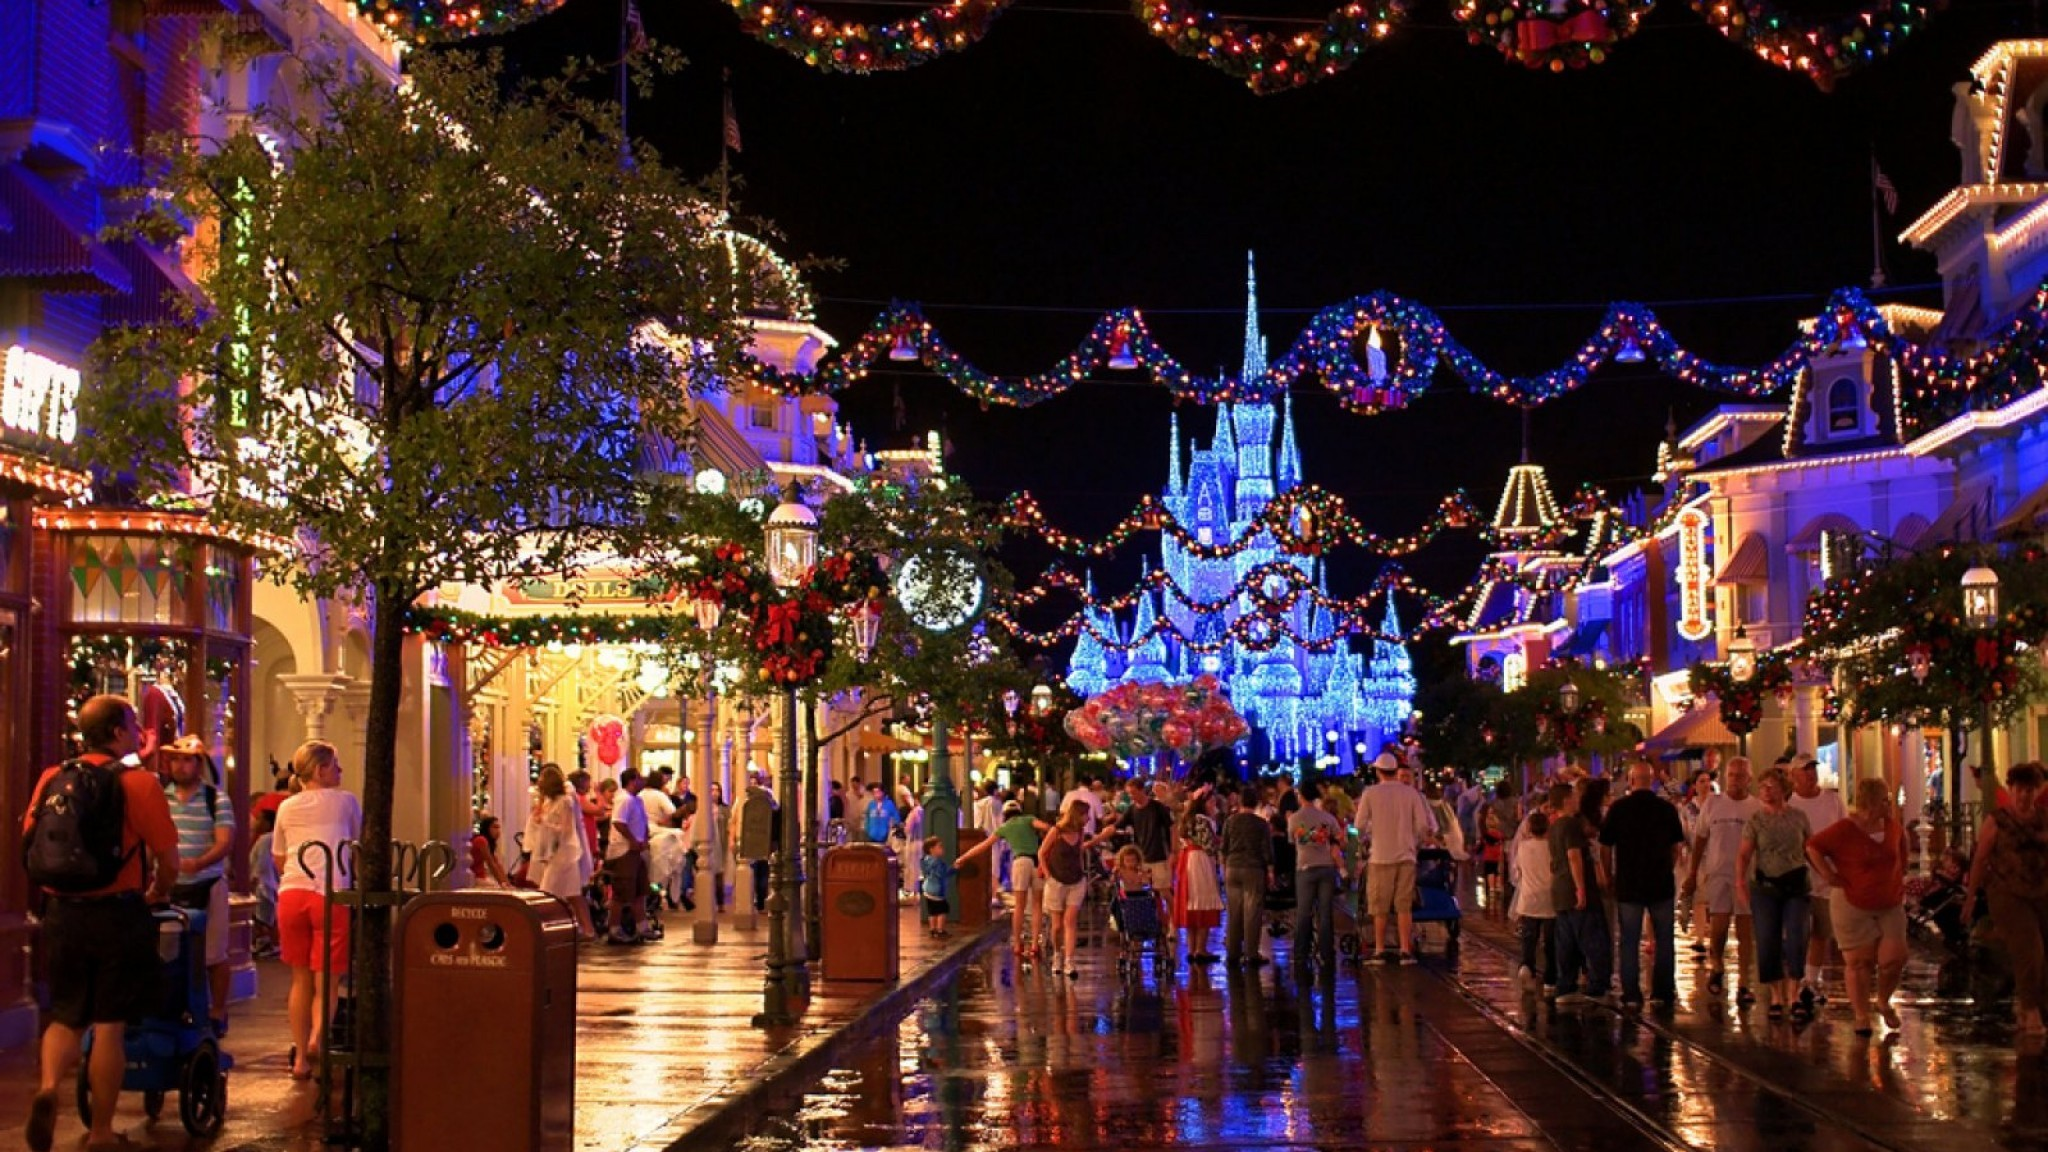 Disney Christmas Background (56+ images)